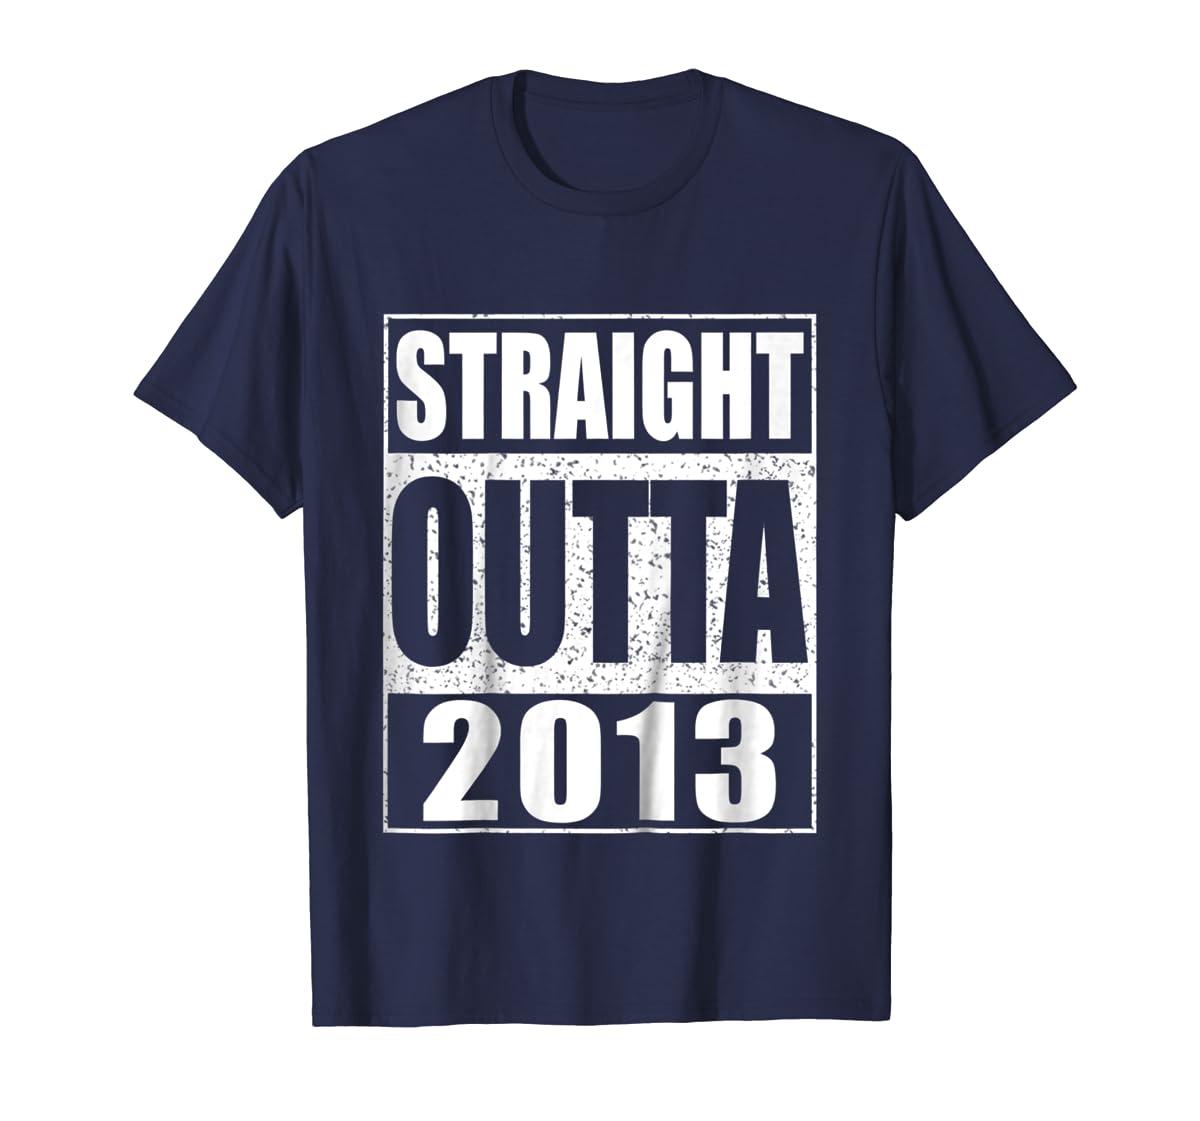 Kids Straight Outta 2013 T-Shirt 6th Birthday Gift Shirt-Men's T-Shirt-Navy